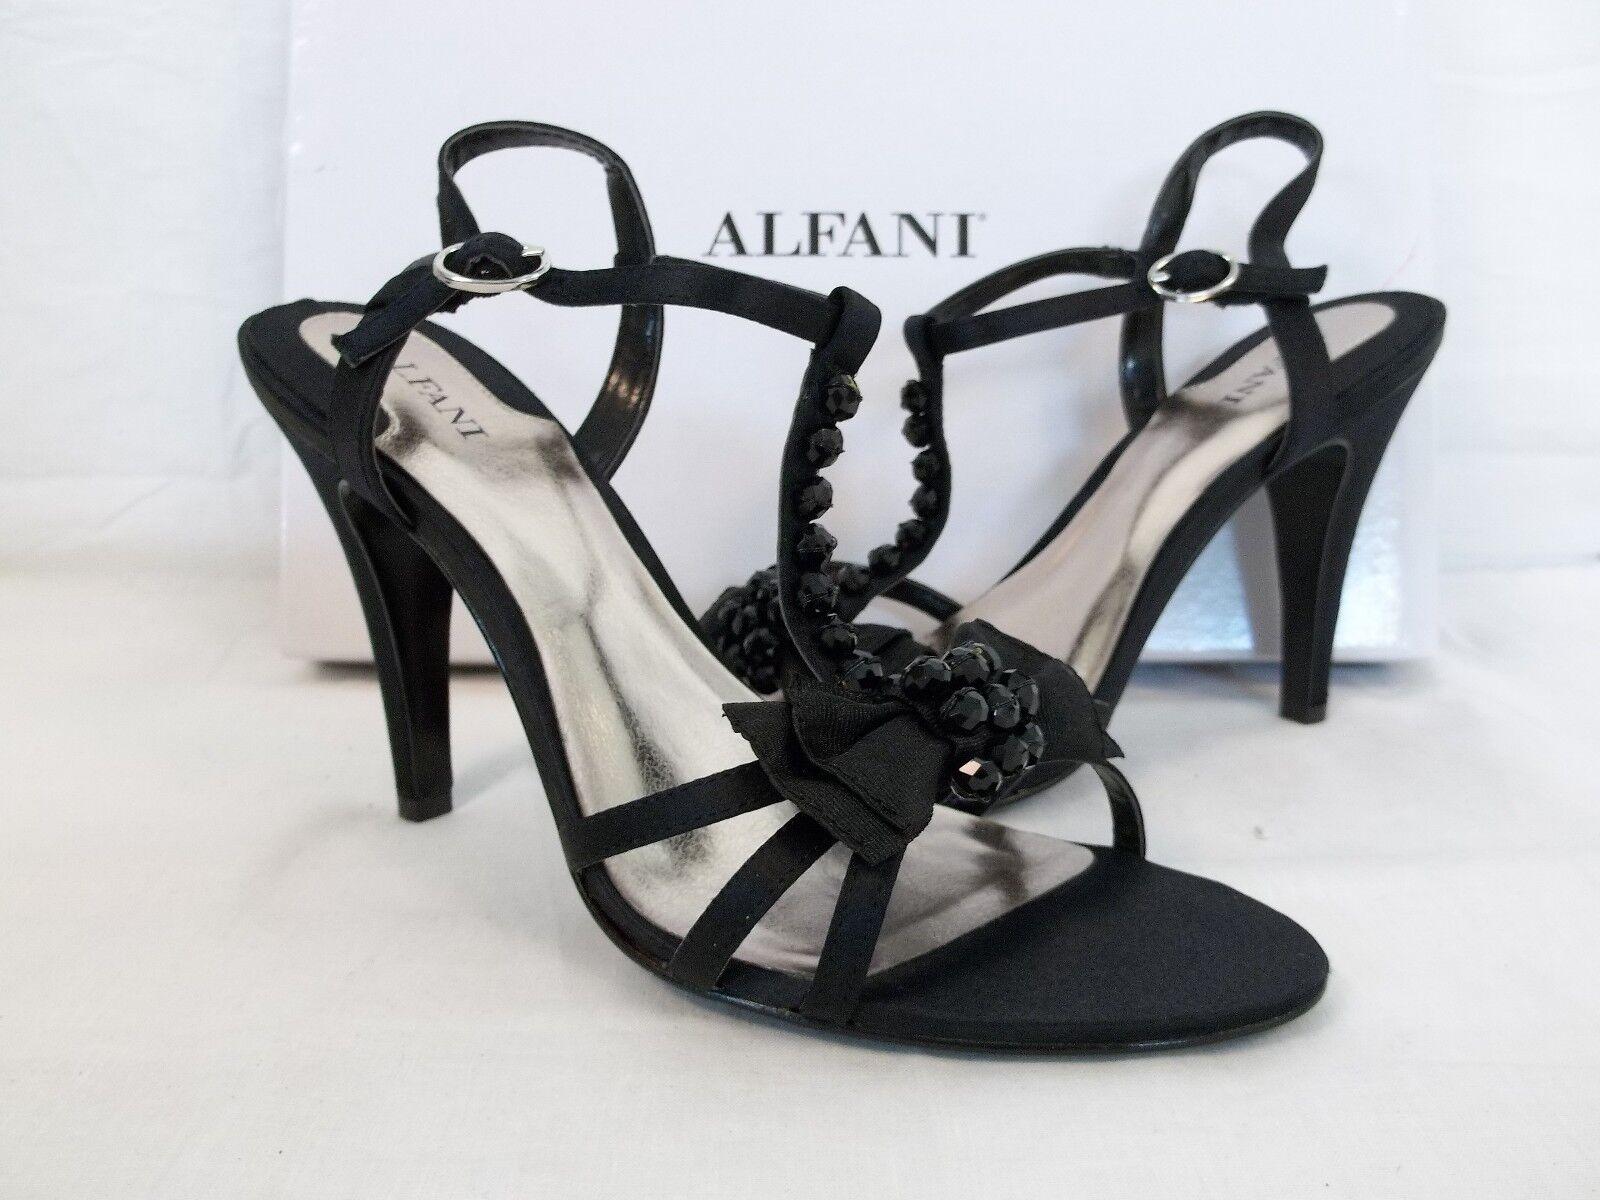 Alfani Size 7 M LaLa Black Open Toe Heels New Womens Shoes